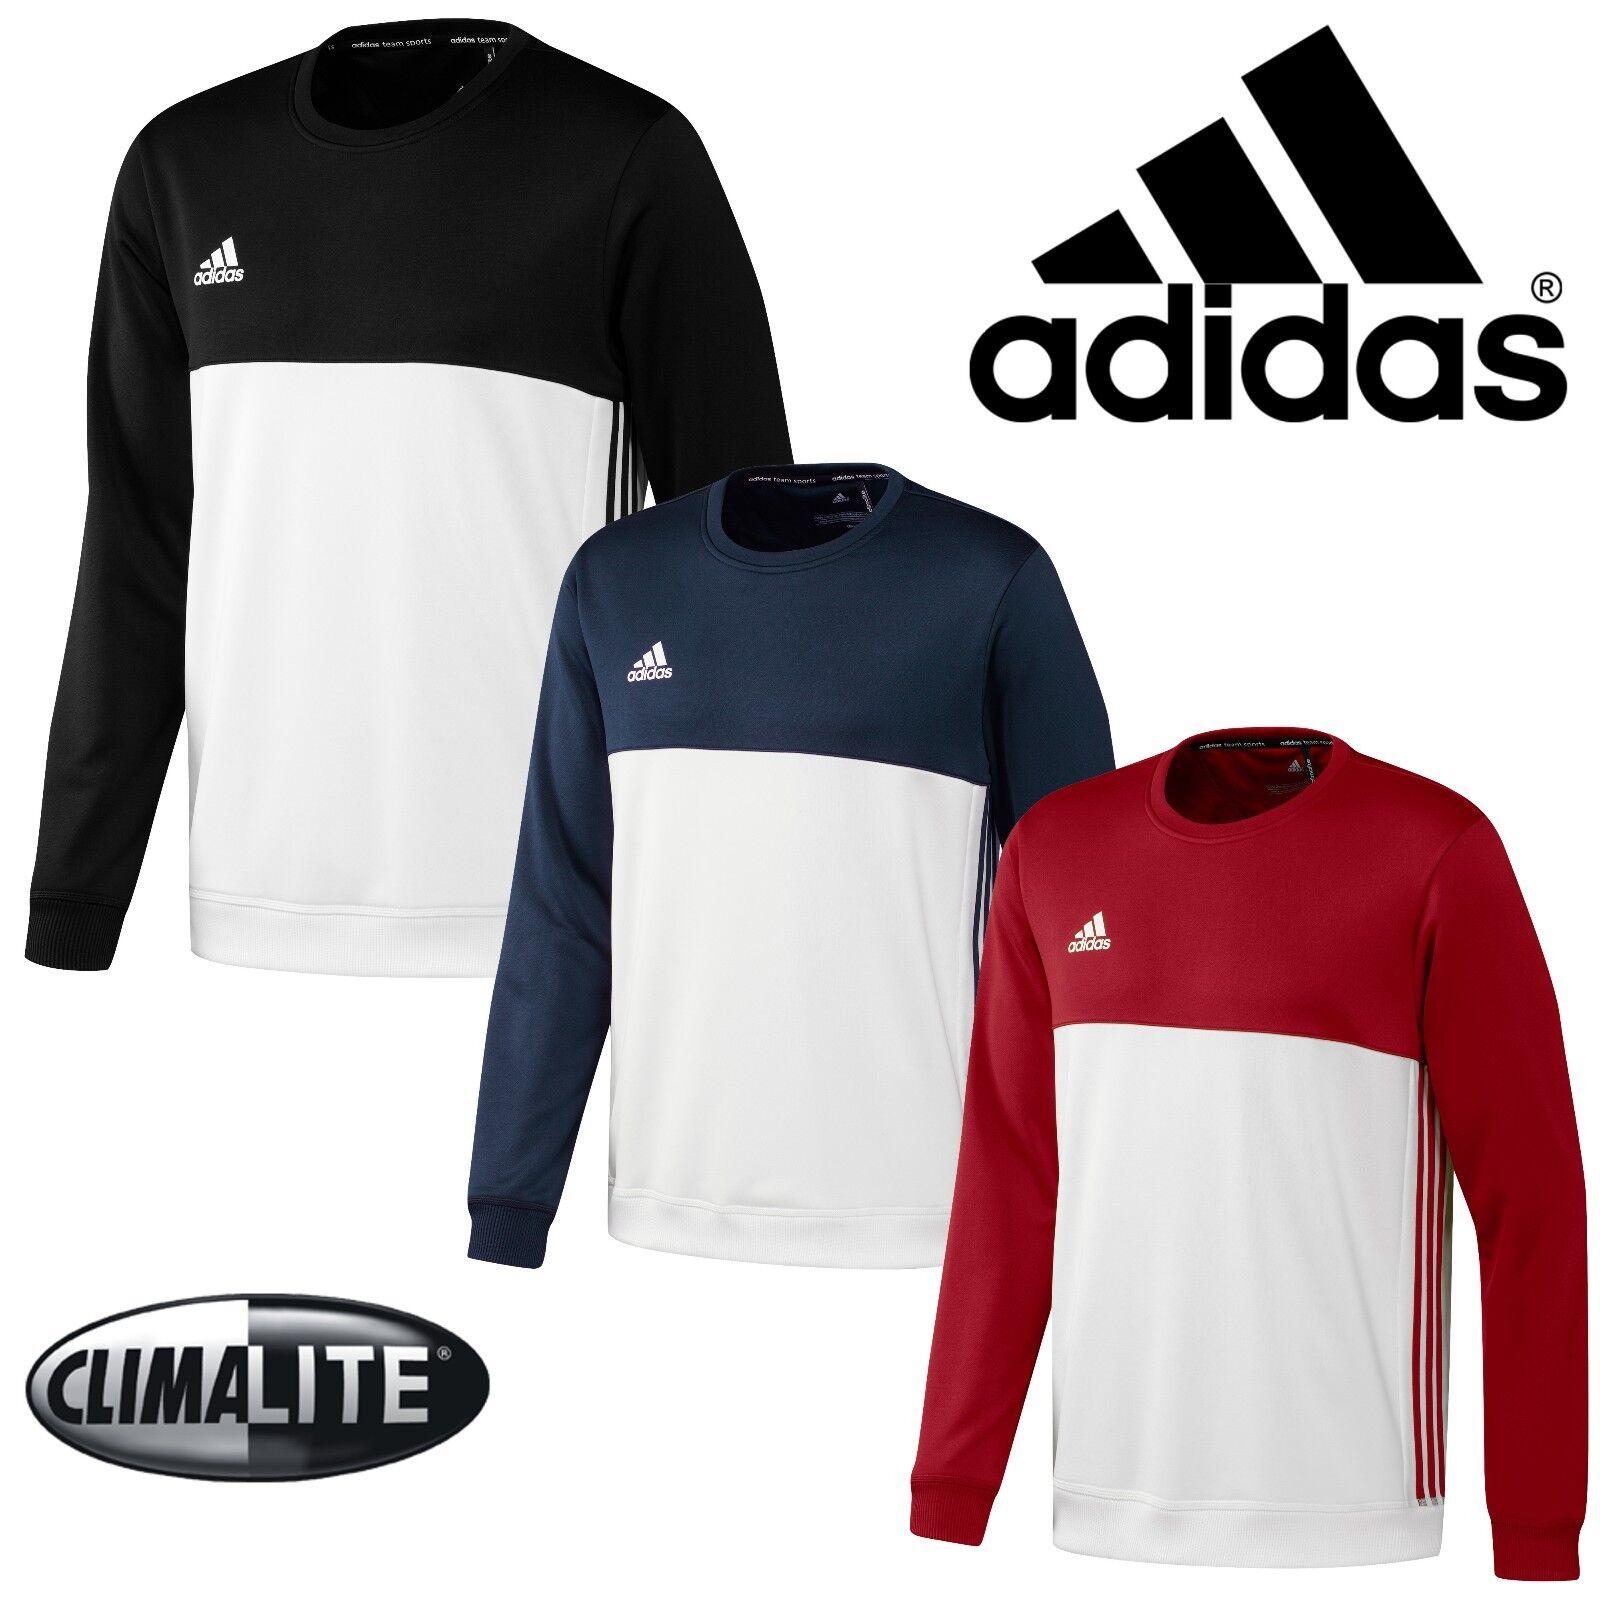 adidas T16 CLIMALITE Férfi pulóver sportcipő Nyakpánt Jumper Top